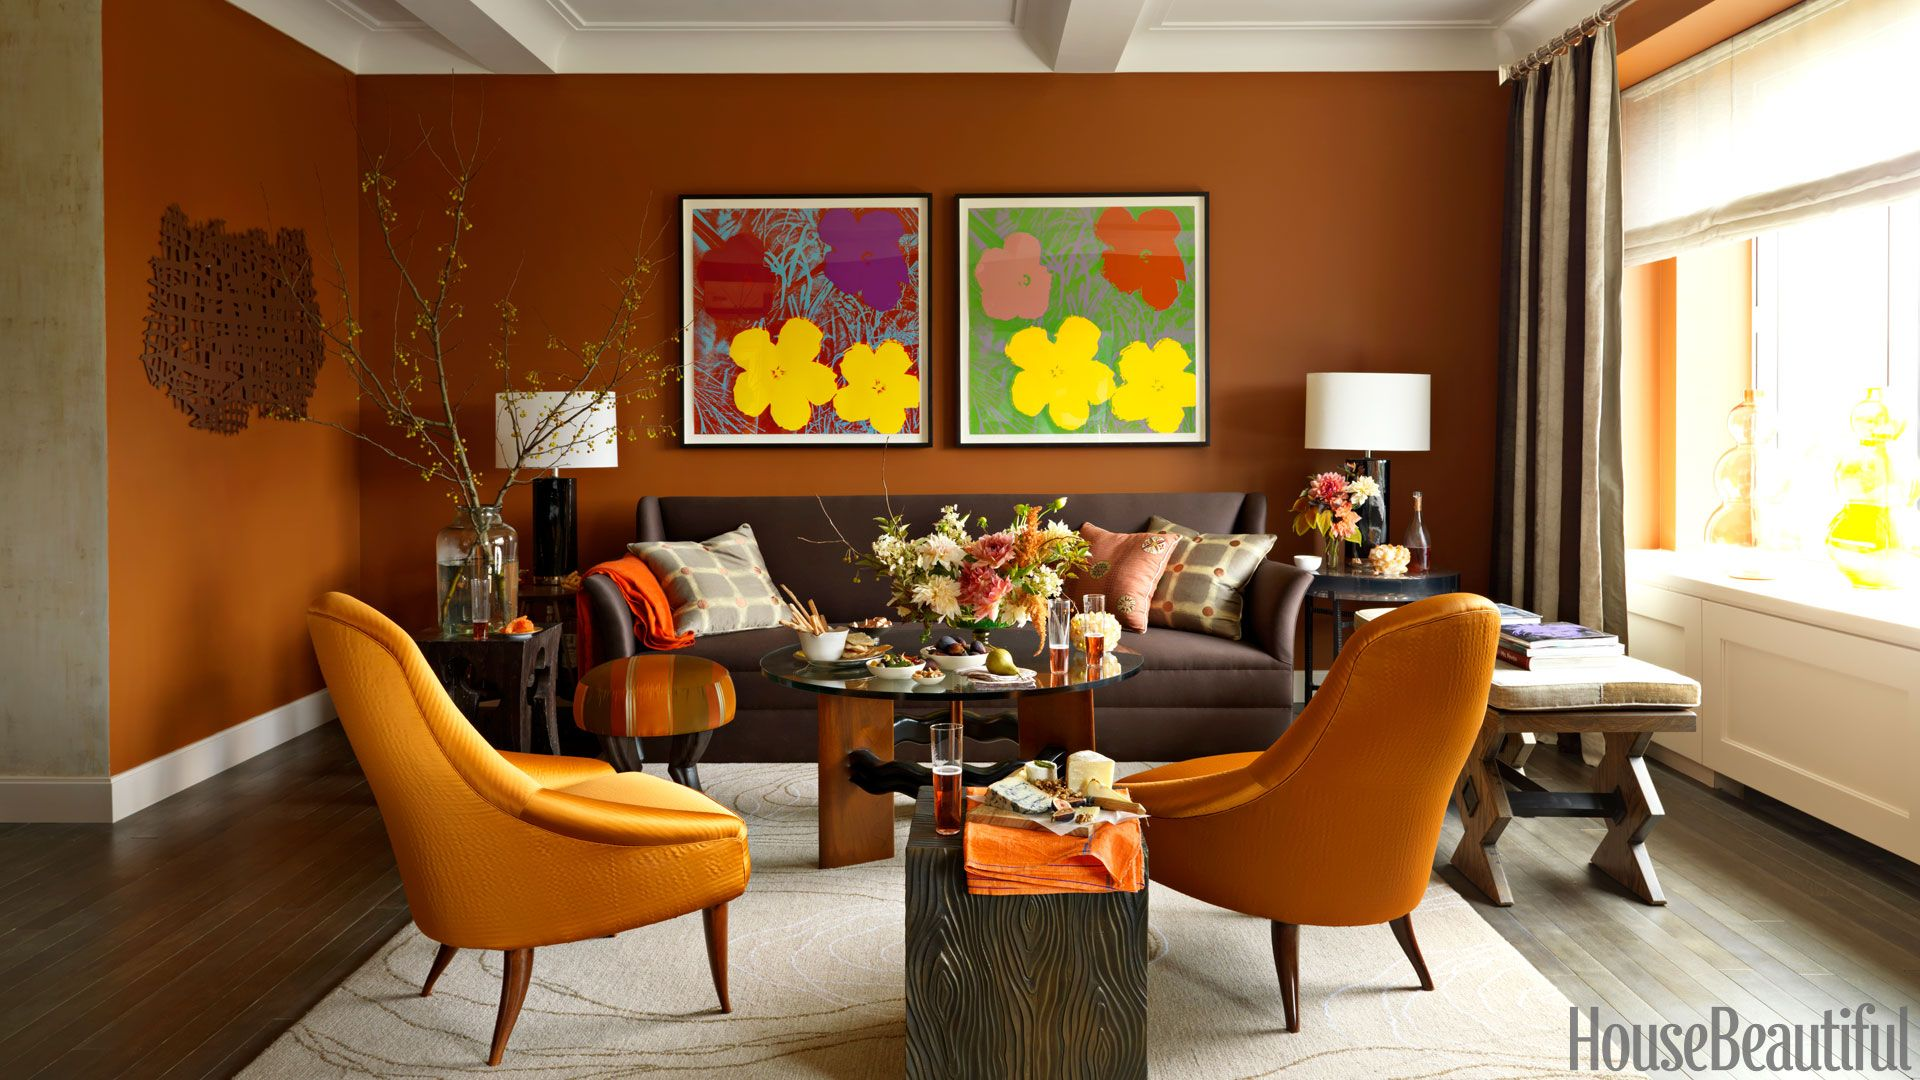 orange midcentury modern chairs